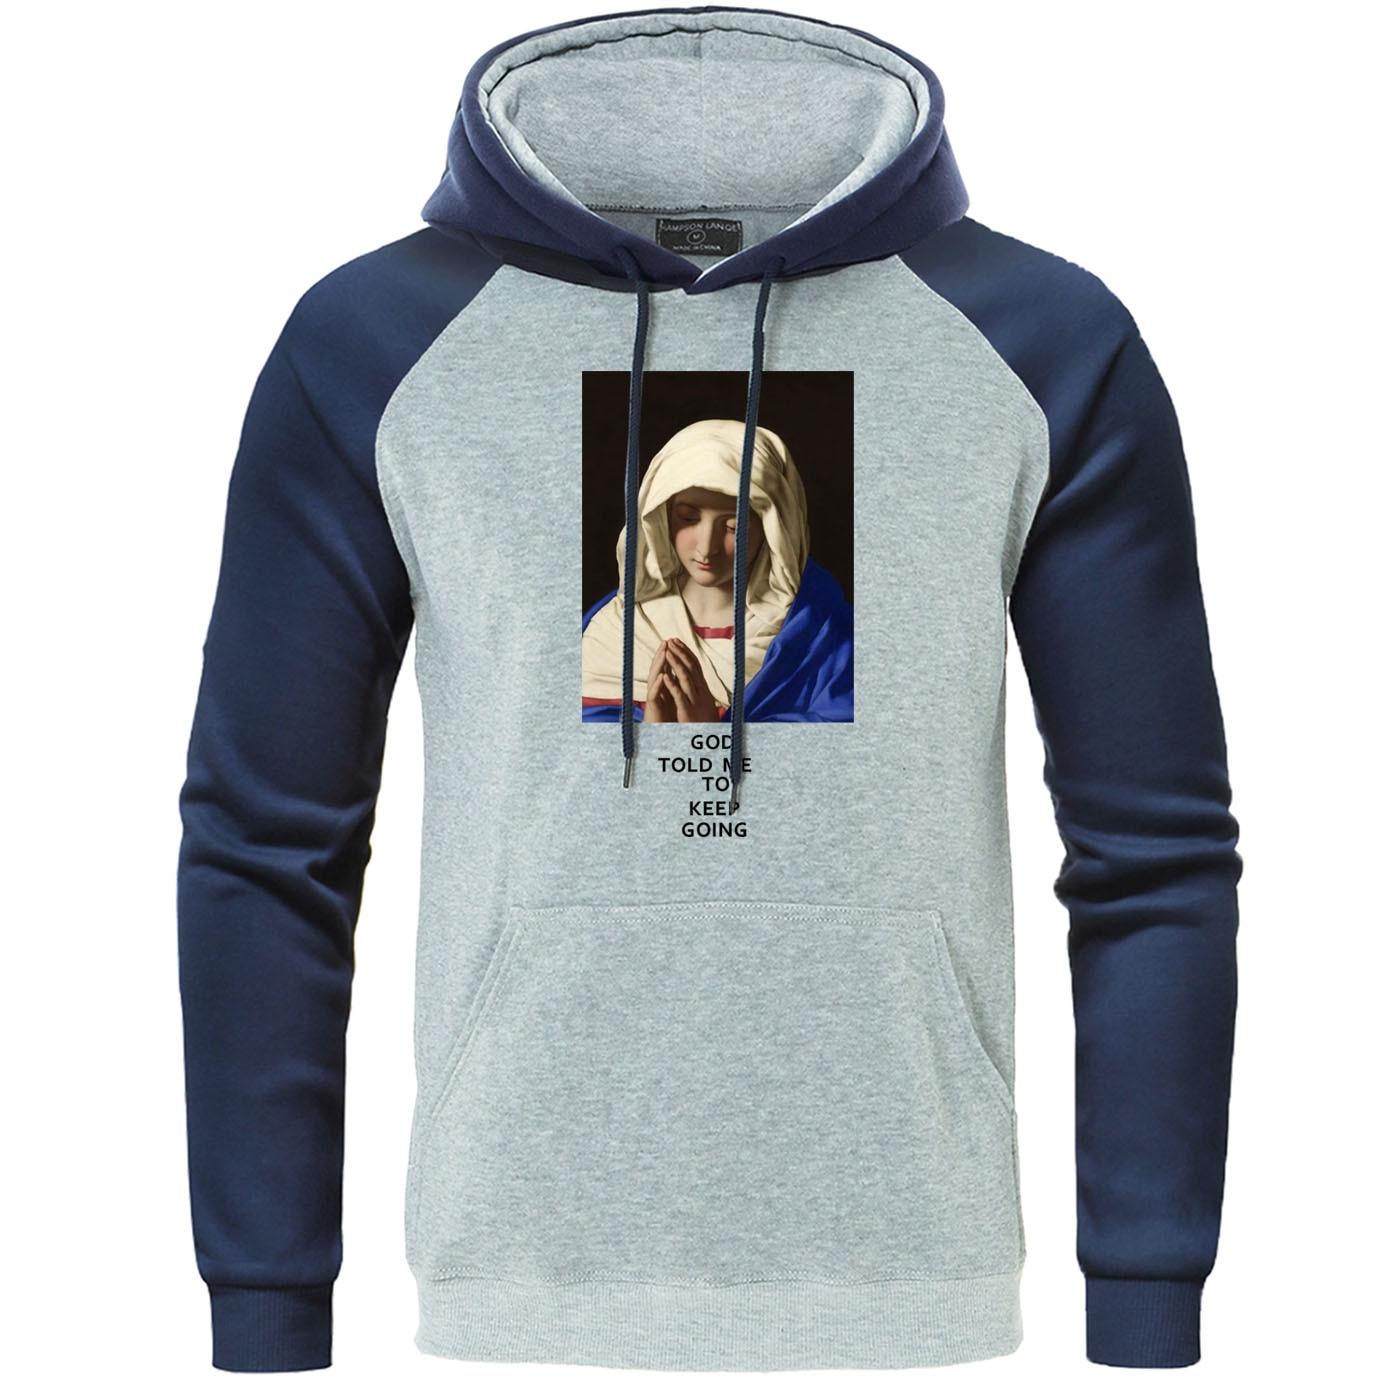 Virgin Mary Printed Men's Hoodies God Told Me Keep Going Raglan Sweatshirt Autumn Warm Streetwear Hip Hop Men Fleece Pullover